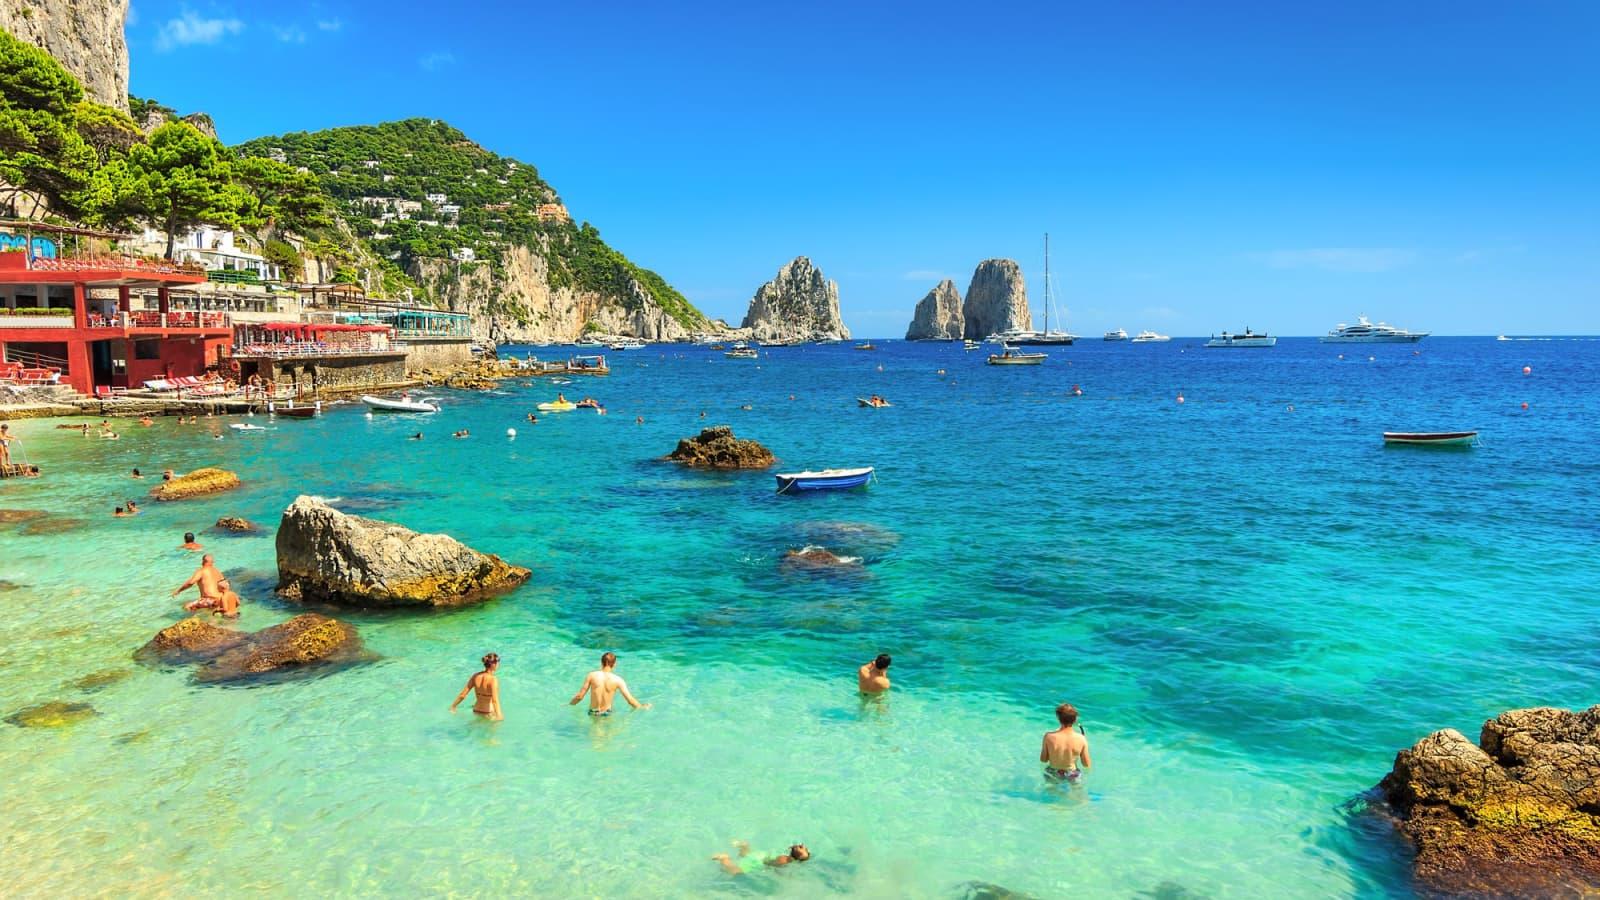 Capri Holidays | Island of Capri, Italy - Topflight  |Capri Beach Scenes